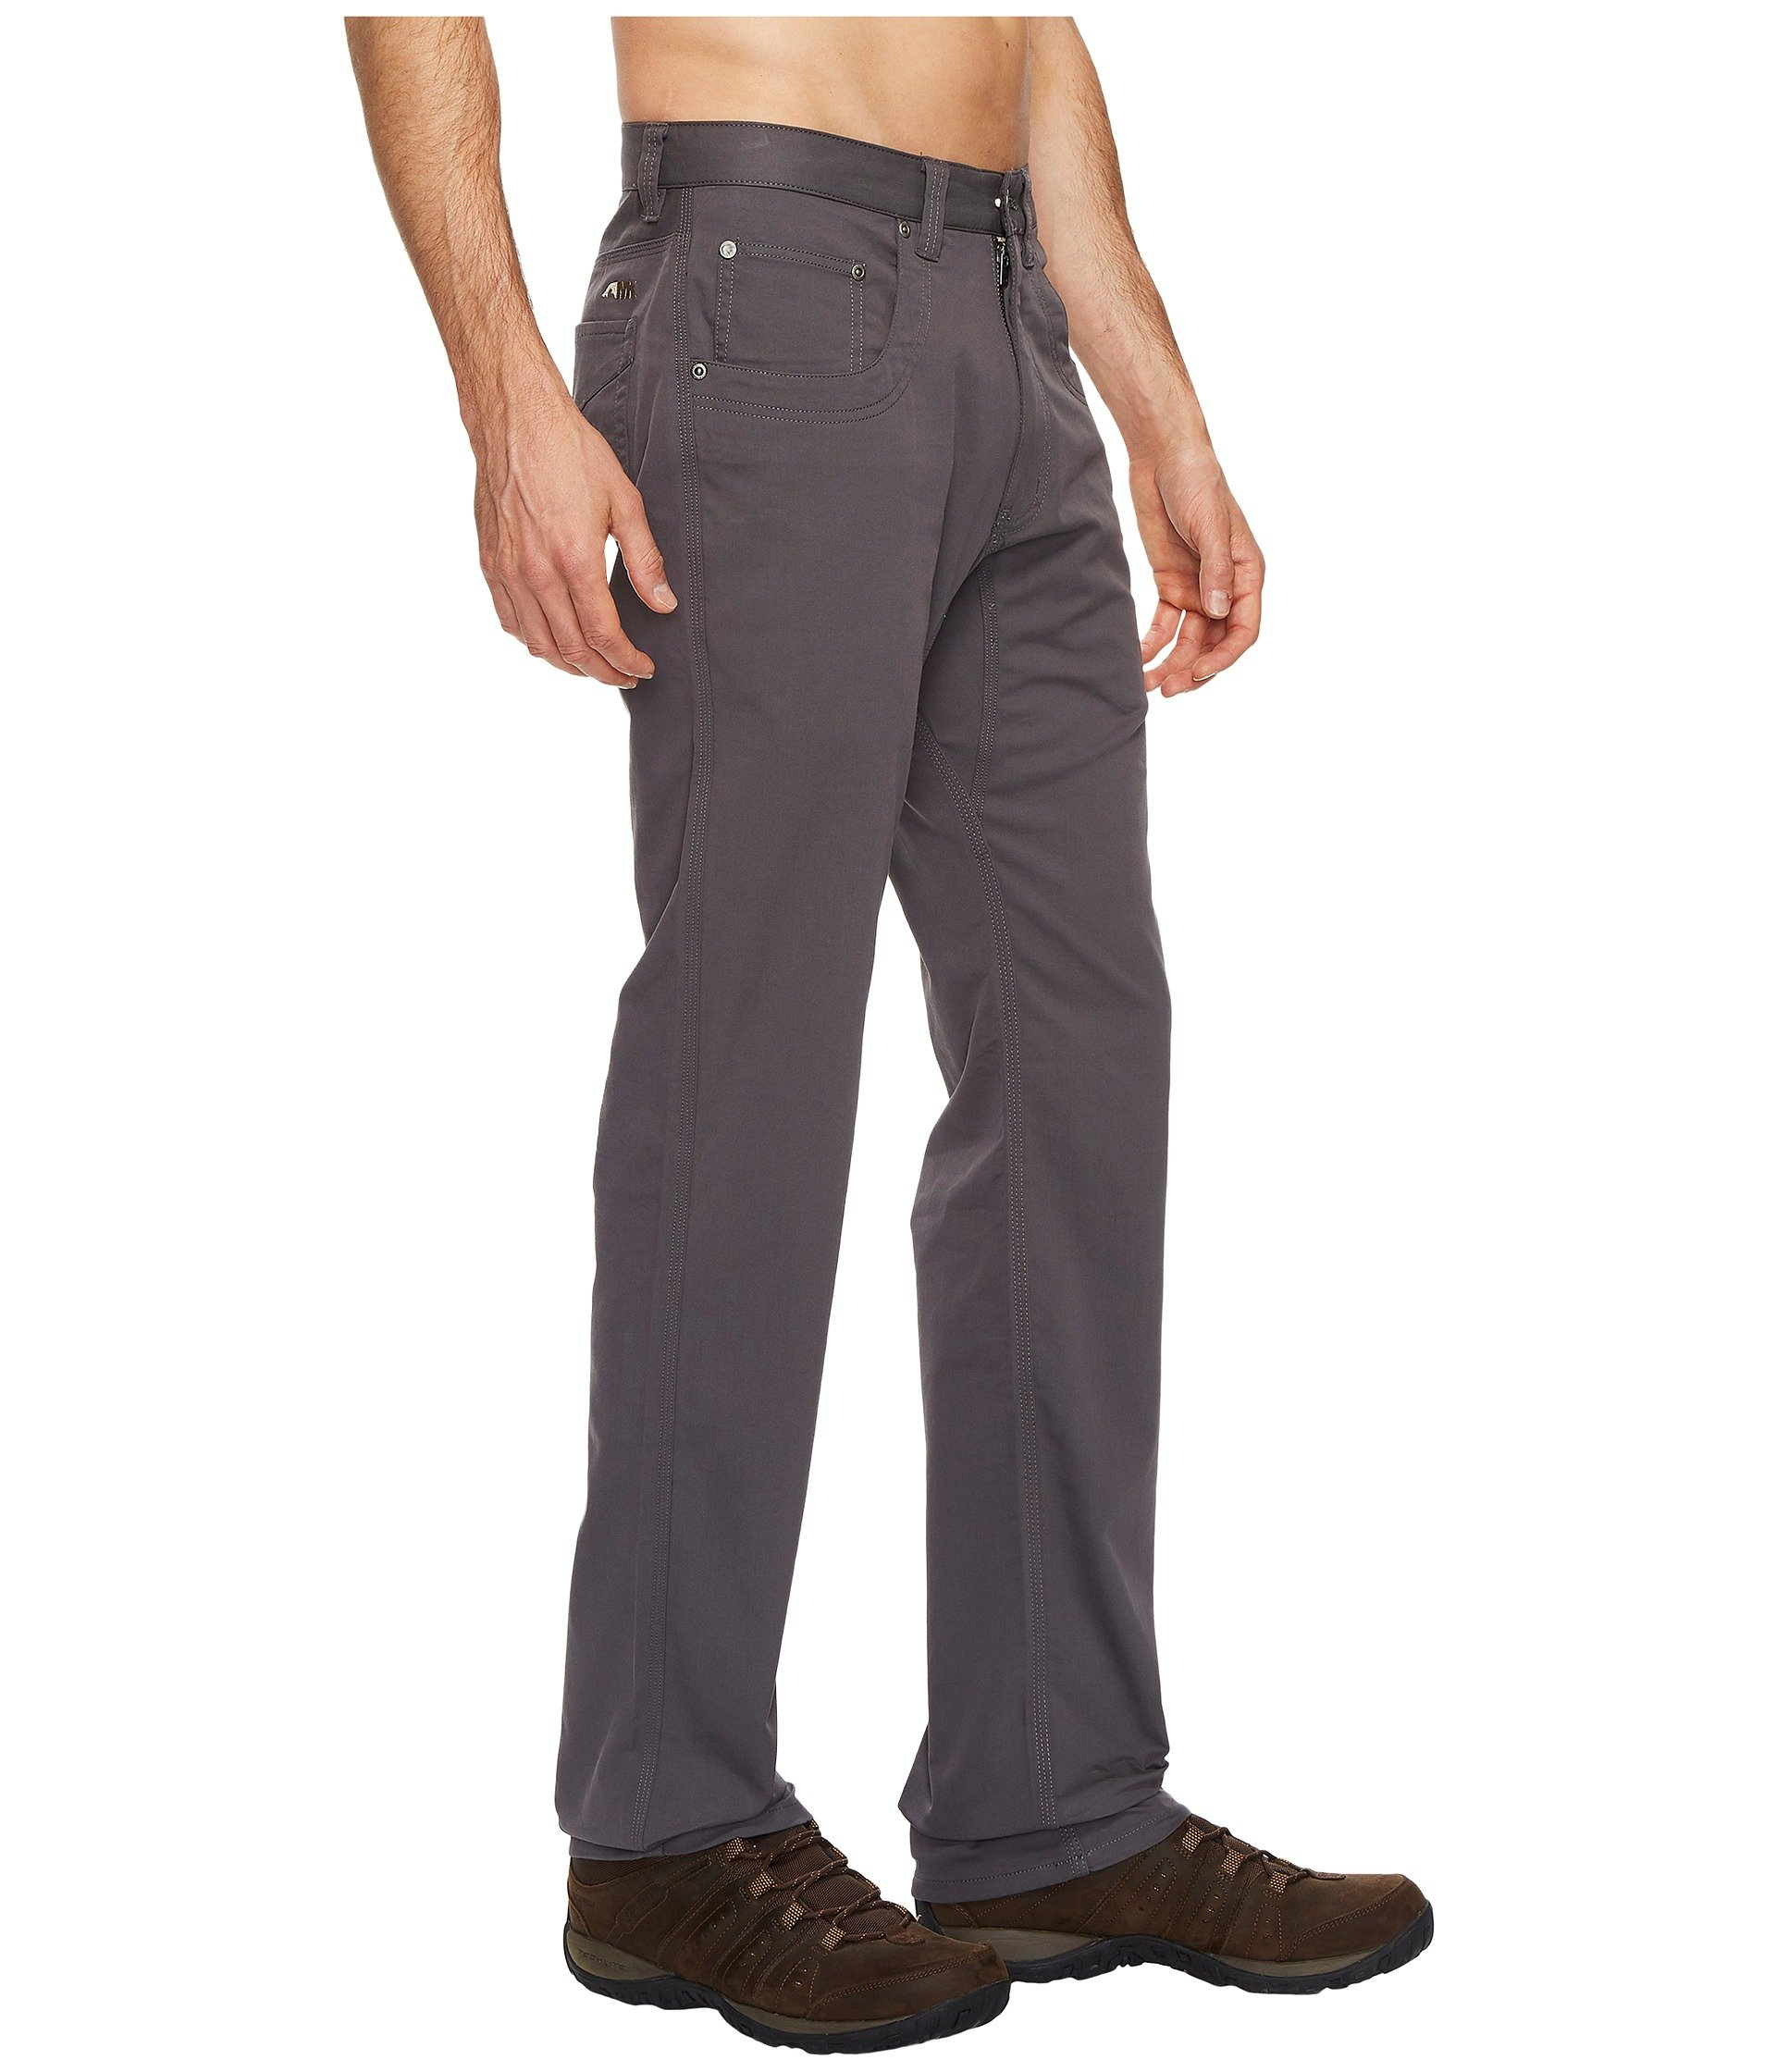 Commuter Pants Slate Camber Mountain Khakis wq8x8a